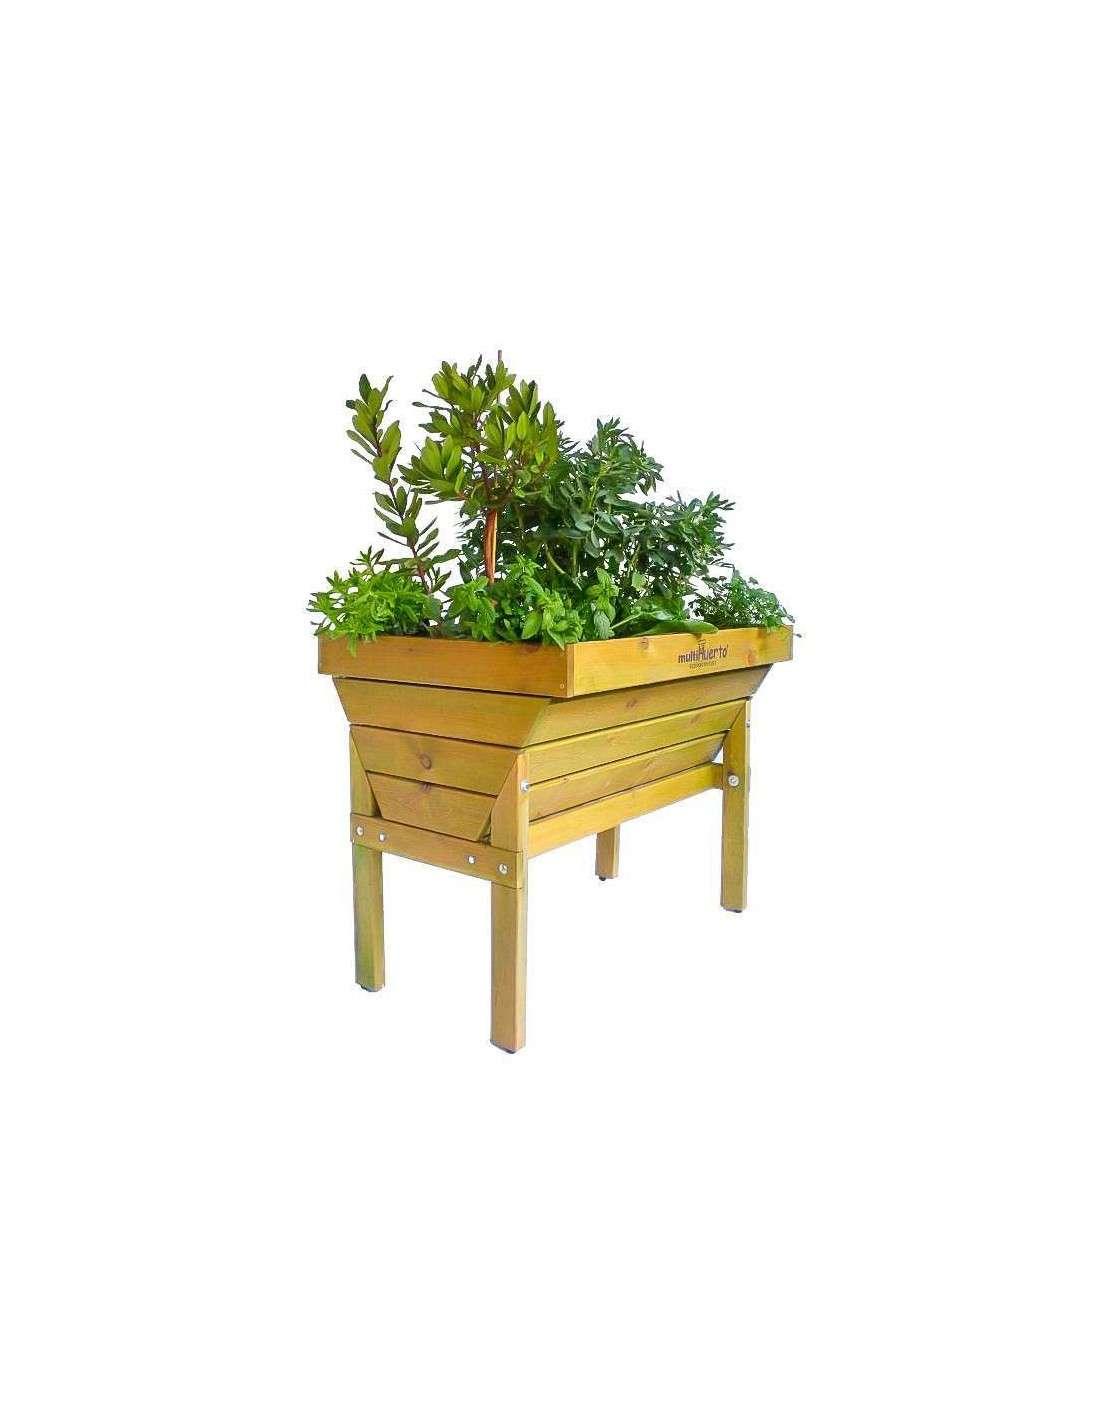 Mesa de cultivo multihuerto 100x70x80cm cocopot huerto urbano - Drenaje mesa de cultivo ...